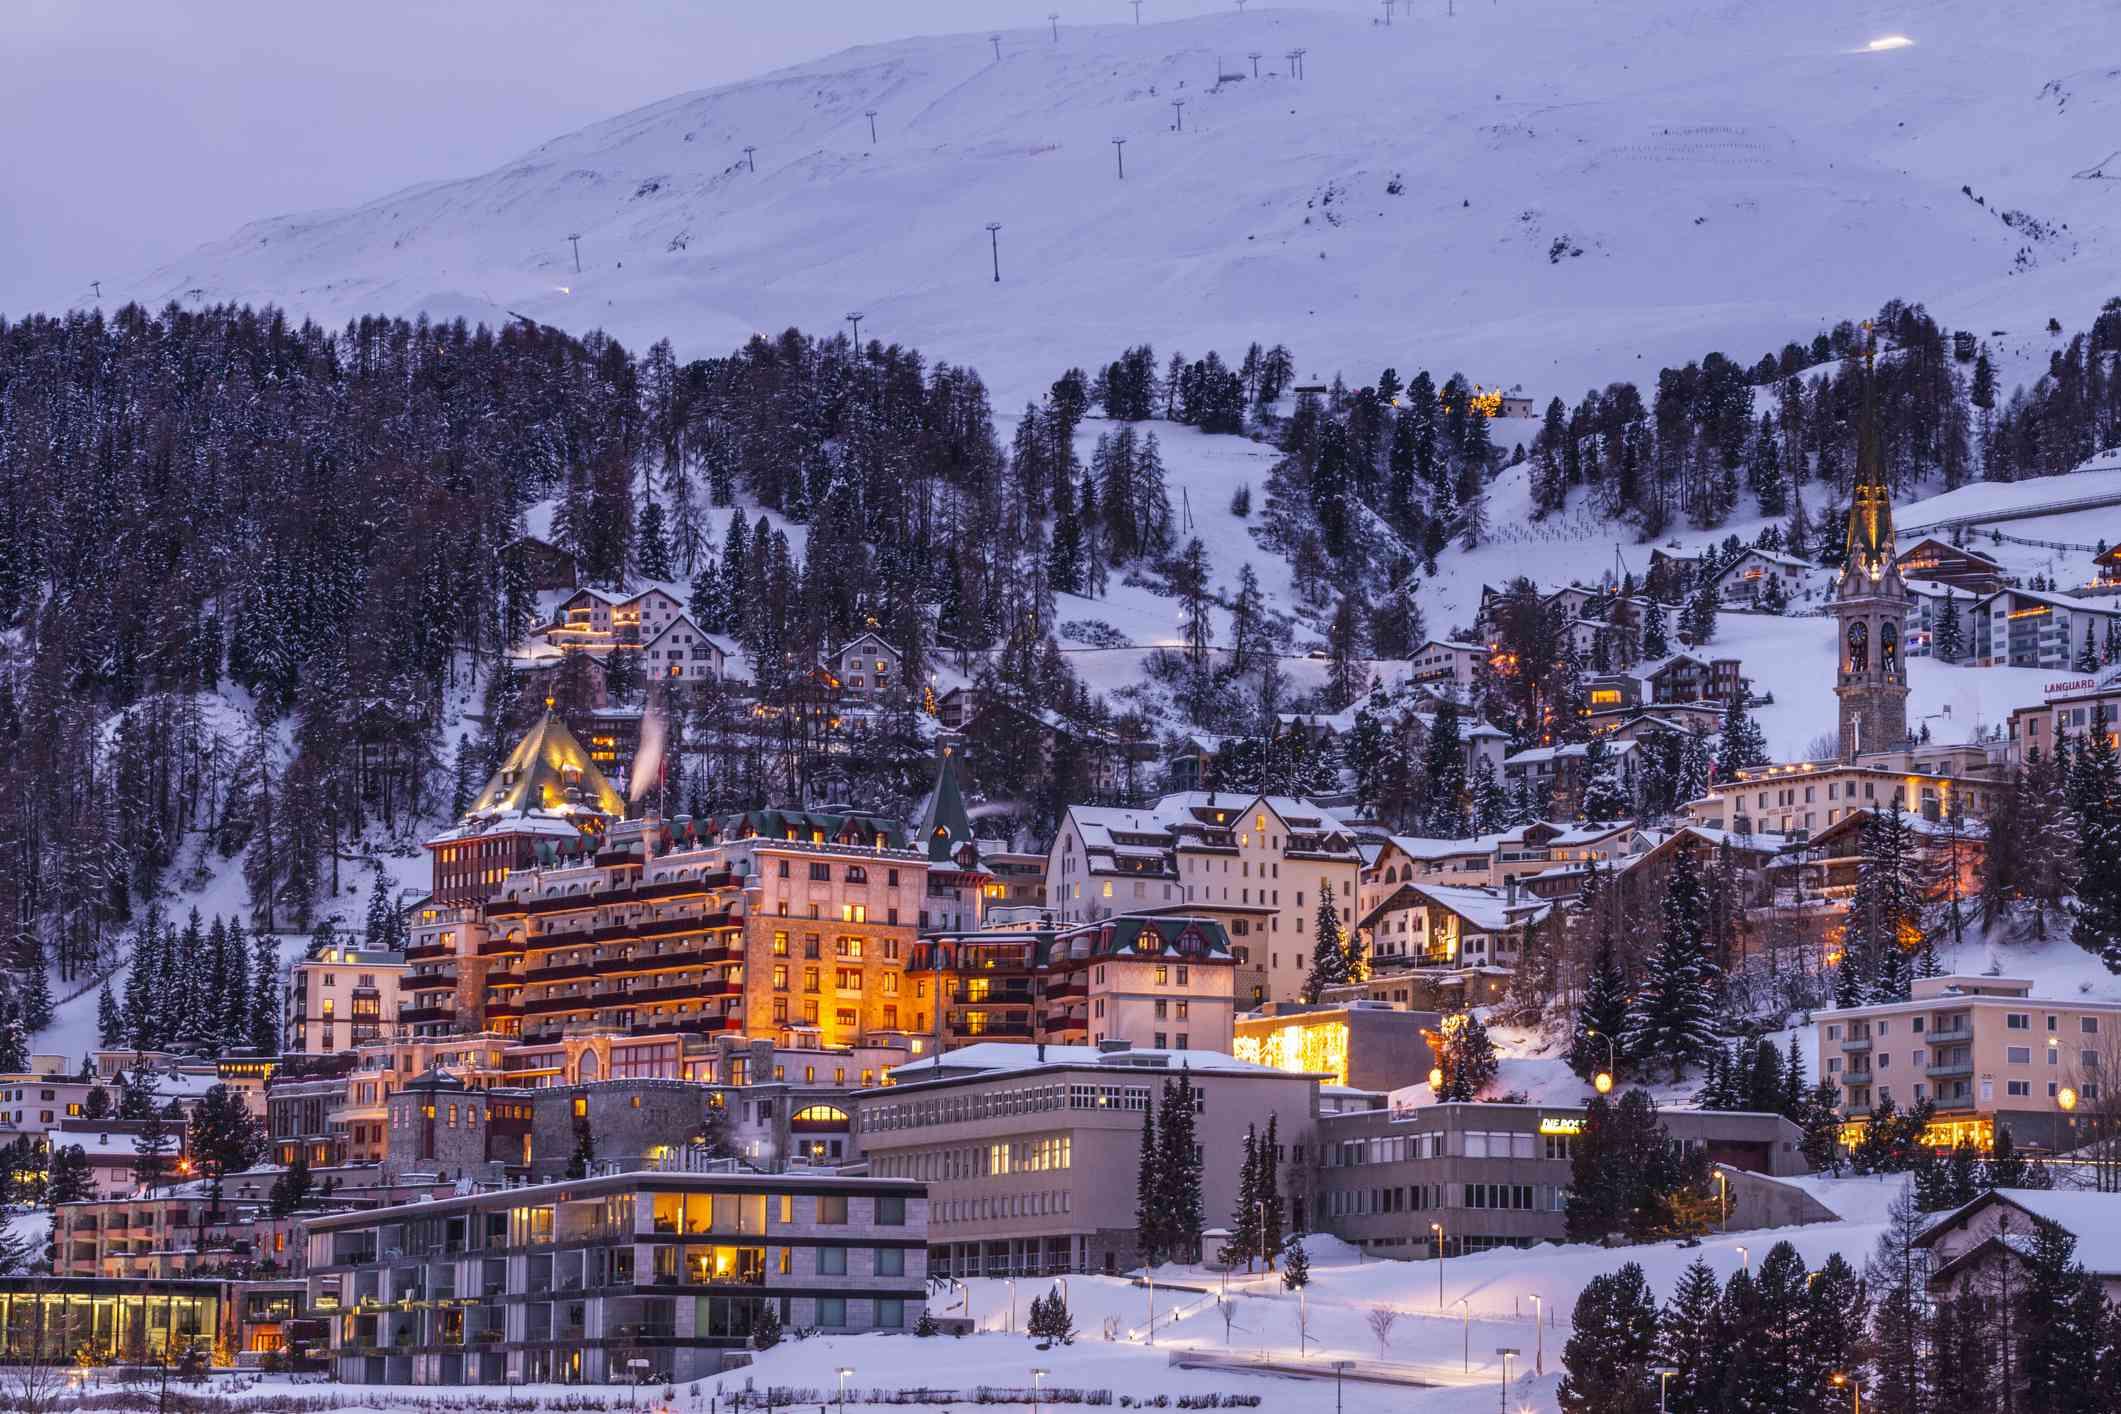 Village beneath mountain on snow covered landscape illuminated in the evening, Sankt Moritz, Switzerland